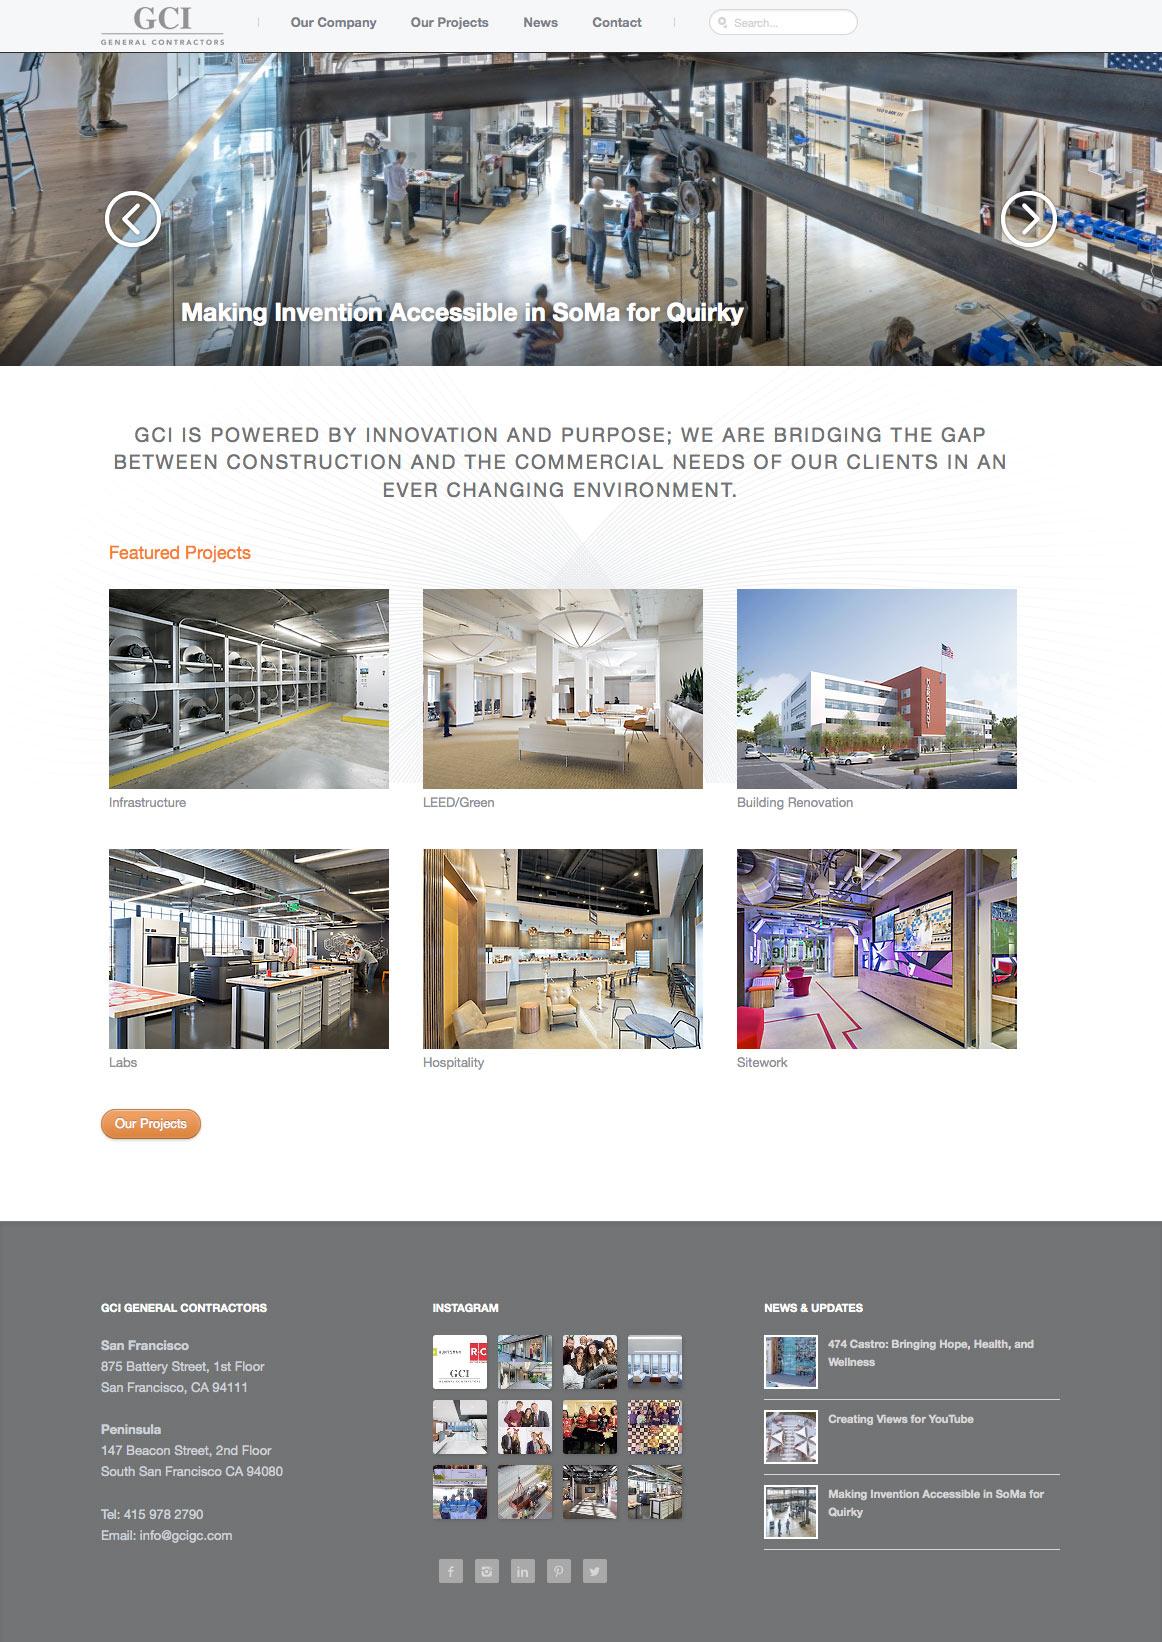 GCI General Contractors: Portfolio site with full-screen slideshows